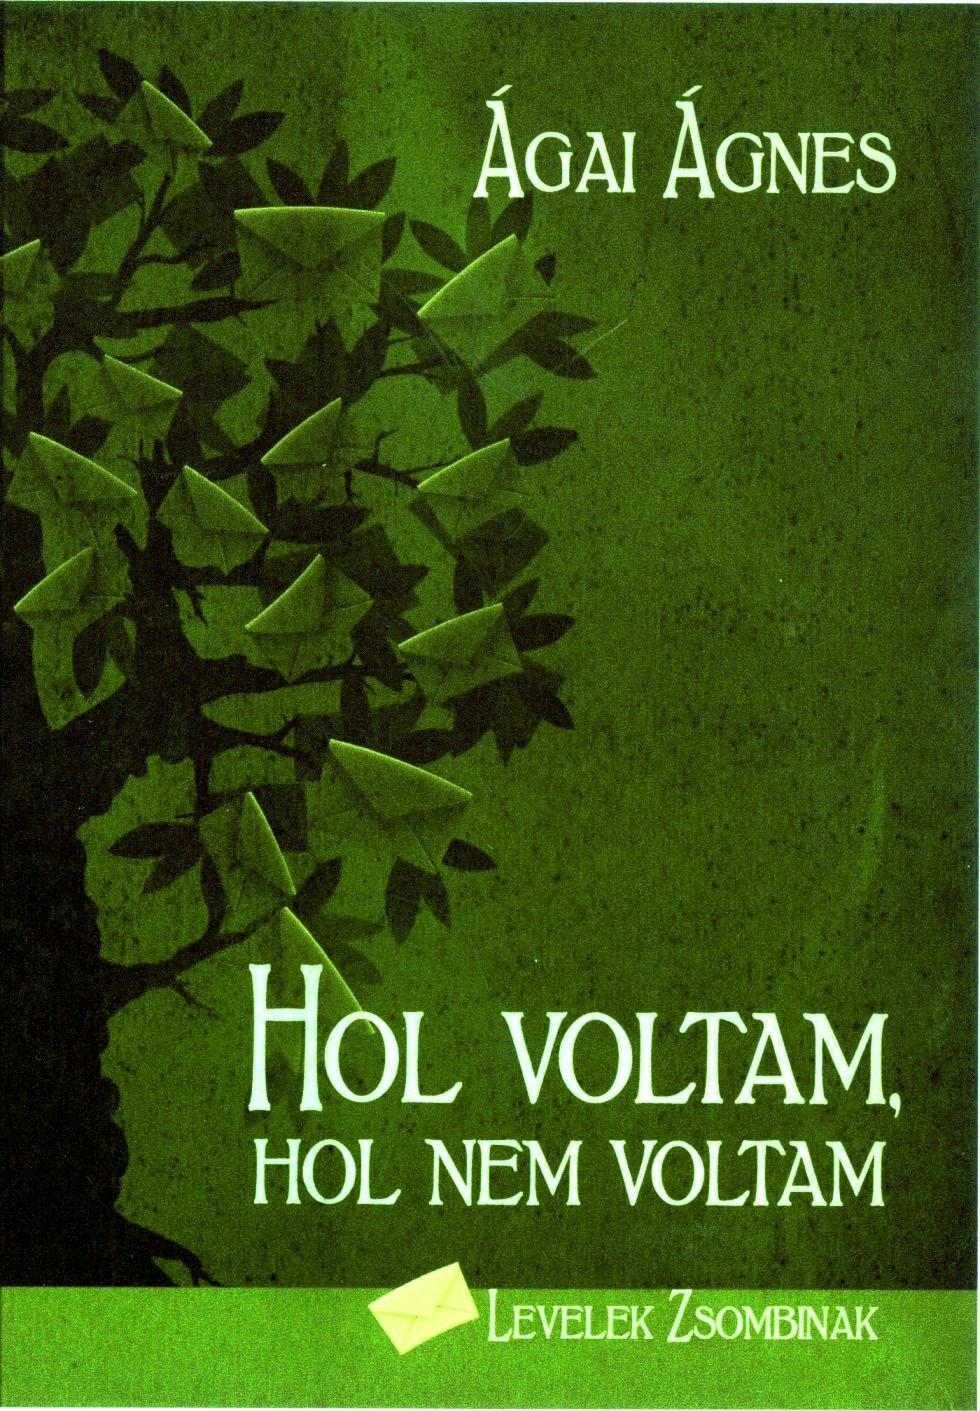 HOL VOLTAM, HOL NEM VOLTAM - LEVELEK ZSOMBINAK